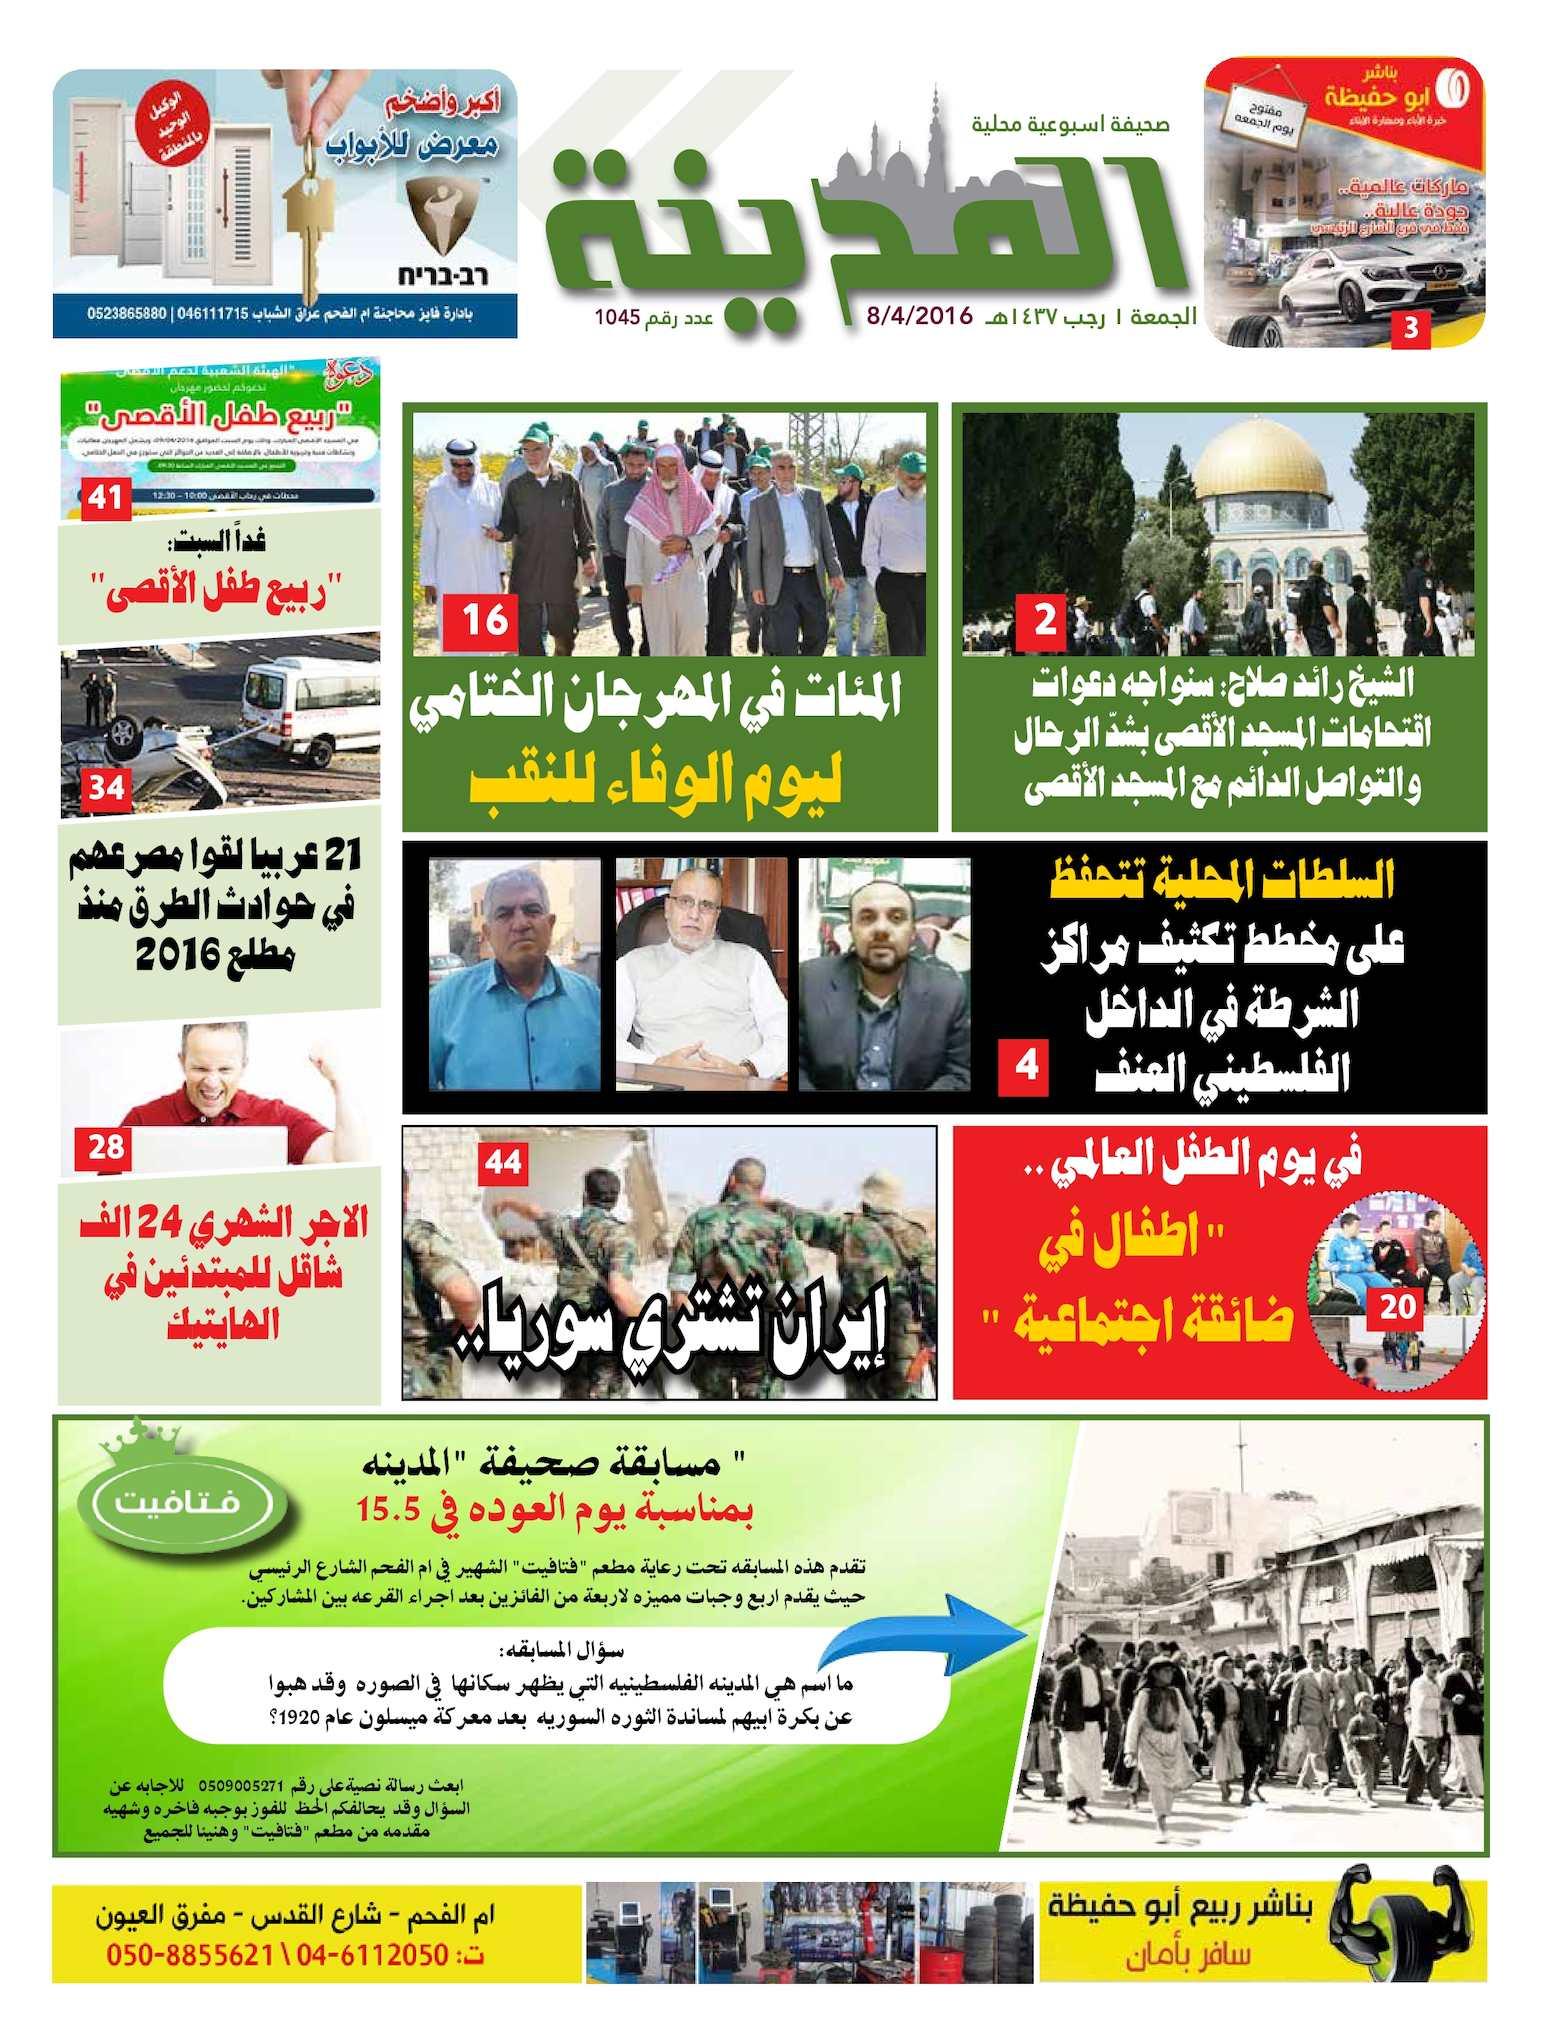 af8fd44bd Calaméo - جريدة المدينة 8.4.2016